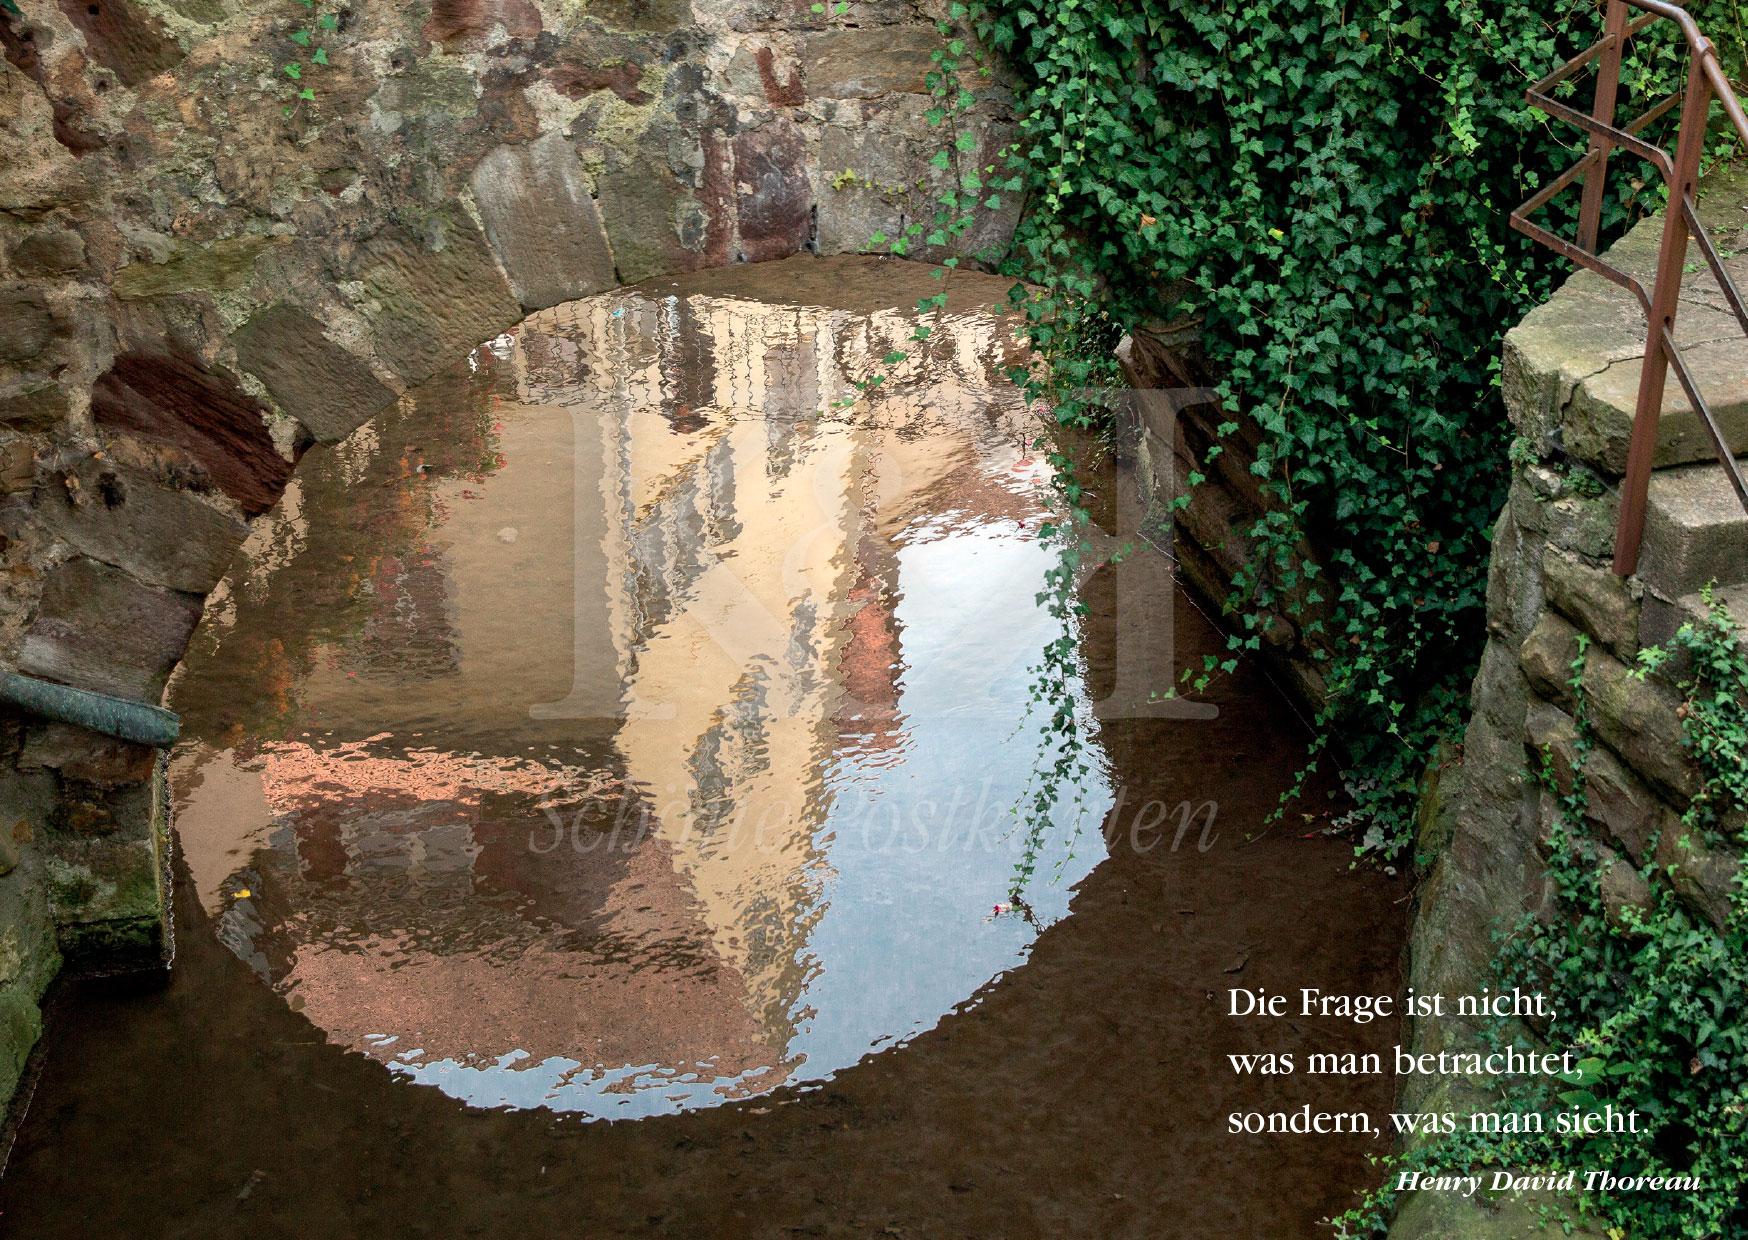 Schöne Postkarte Nr. 30 · Die Ammer in Tübingen beim Café Piccolo Sole d'Oro · © www.schoenpostkarten.de